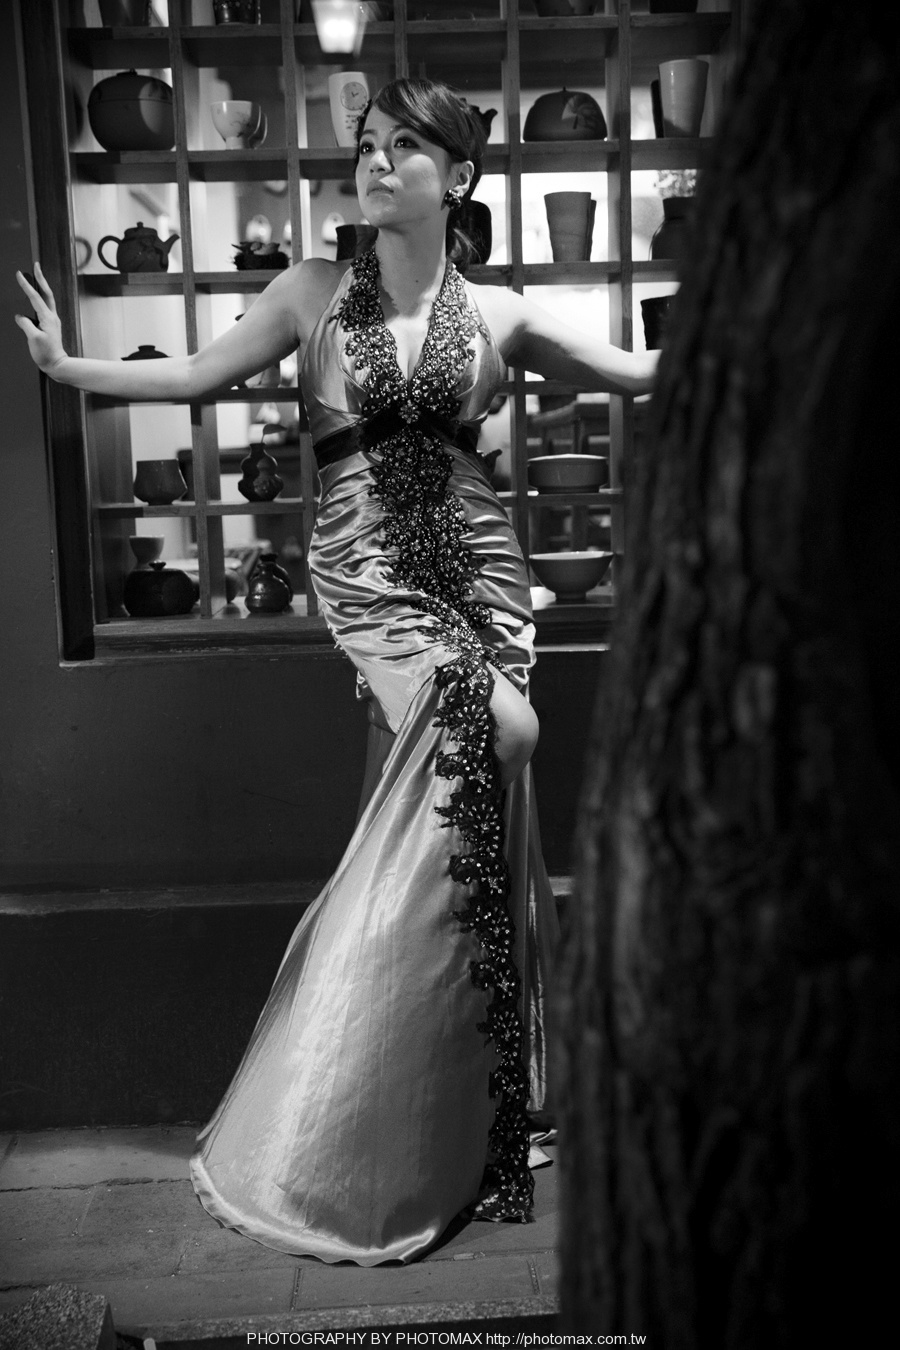 Tiffany Kwan PHOTO MAX 绕着世界拍爱情 PHOTOMAX 老麦摄影 (8)